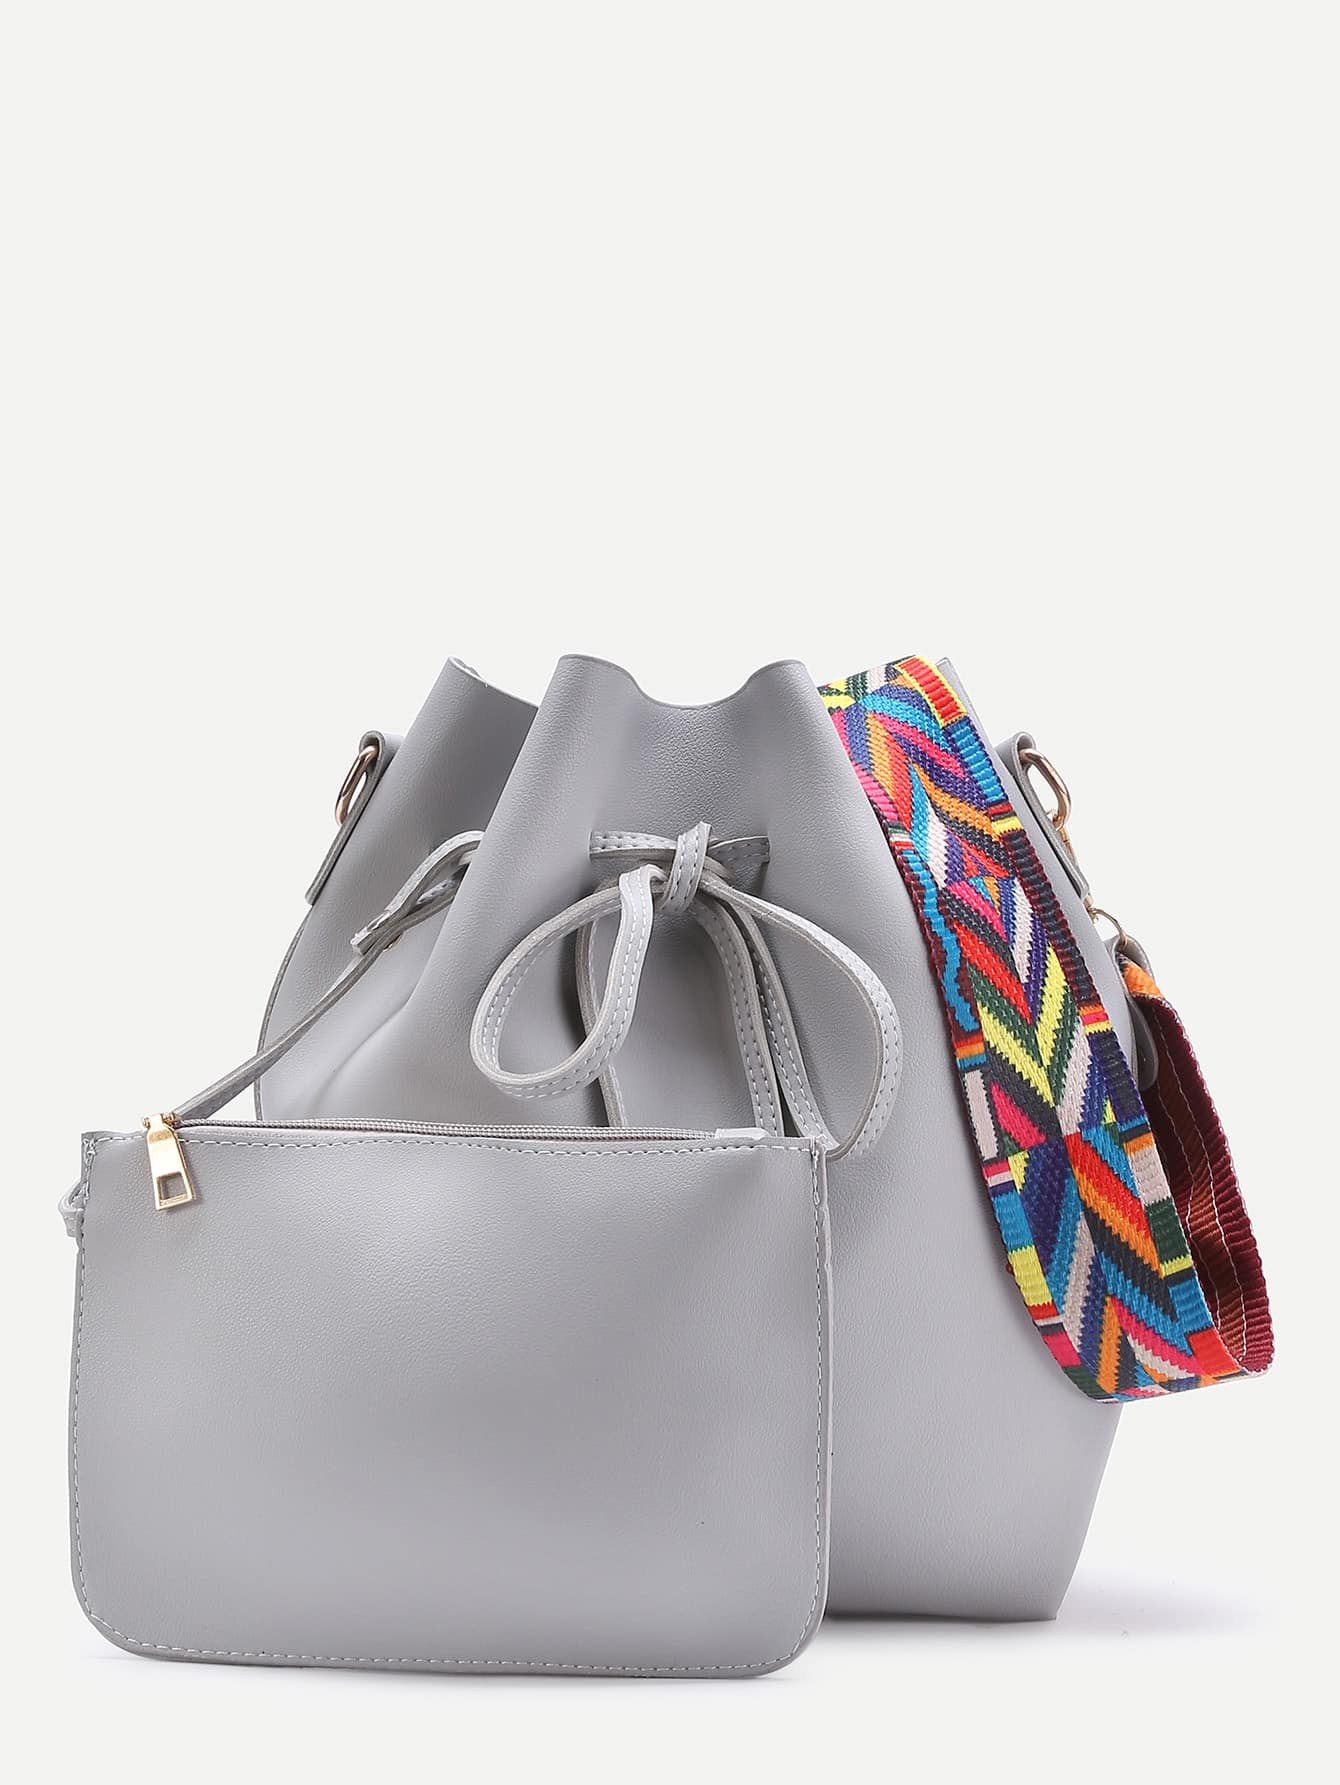 Contrast Strap Drawstring Bucket Bag With Crossbody